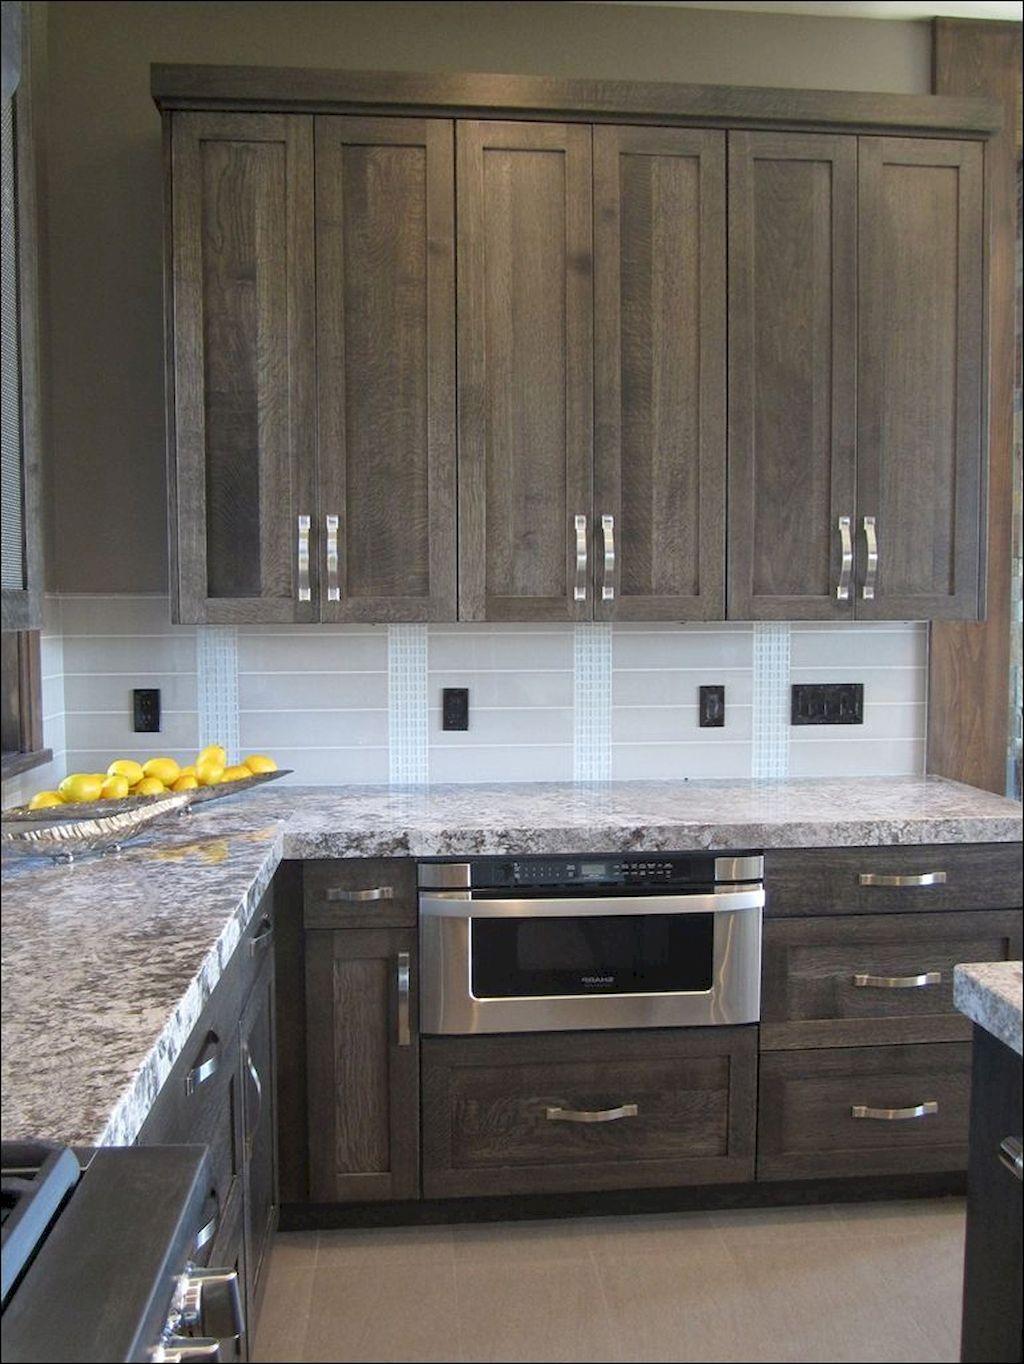 Modern Grey Kitchen Kitchen Cabinets Decor Kitchen Cabinets Makeover Kitchen Cabin In 2020 Kitchen Cabinets Decor Modern Grey Kitchen Stained Kitchen Cabinets